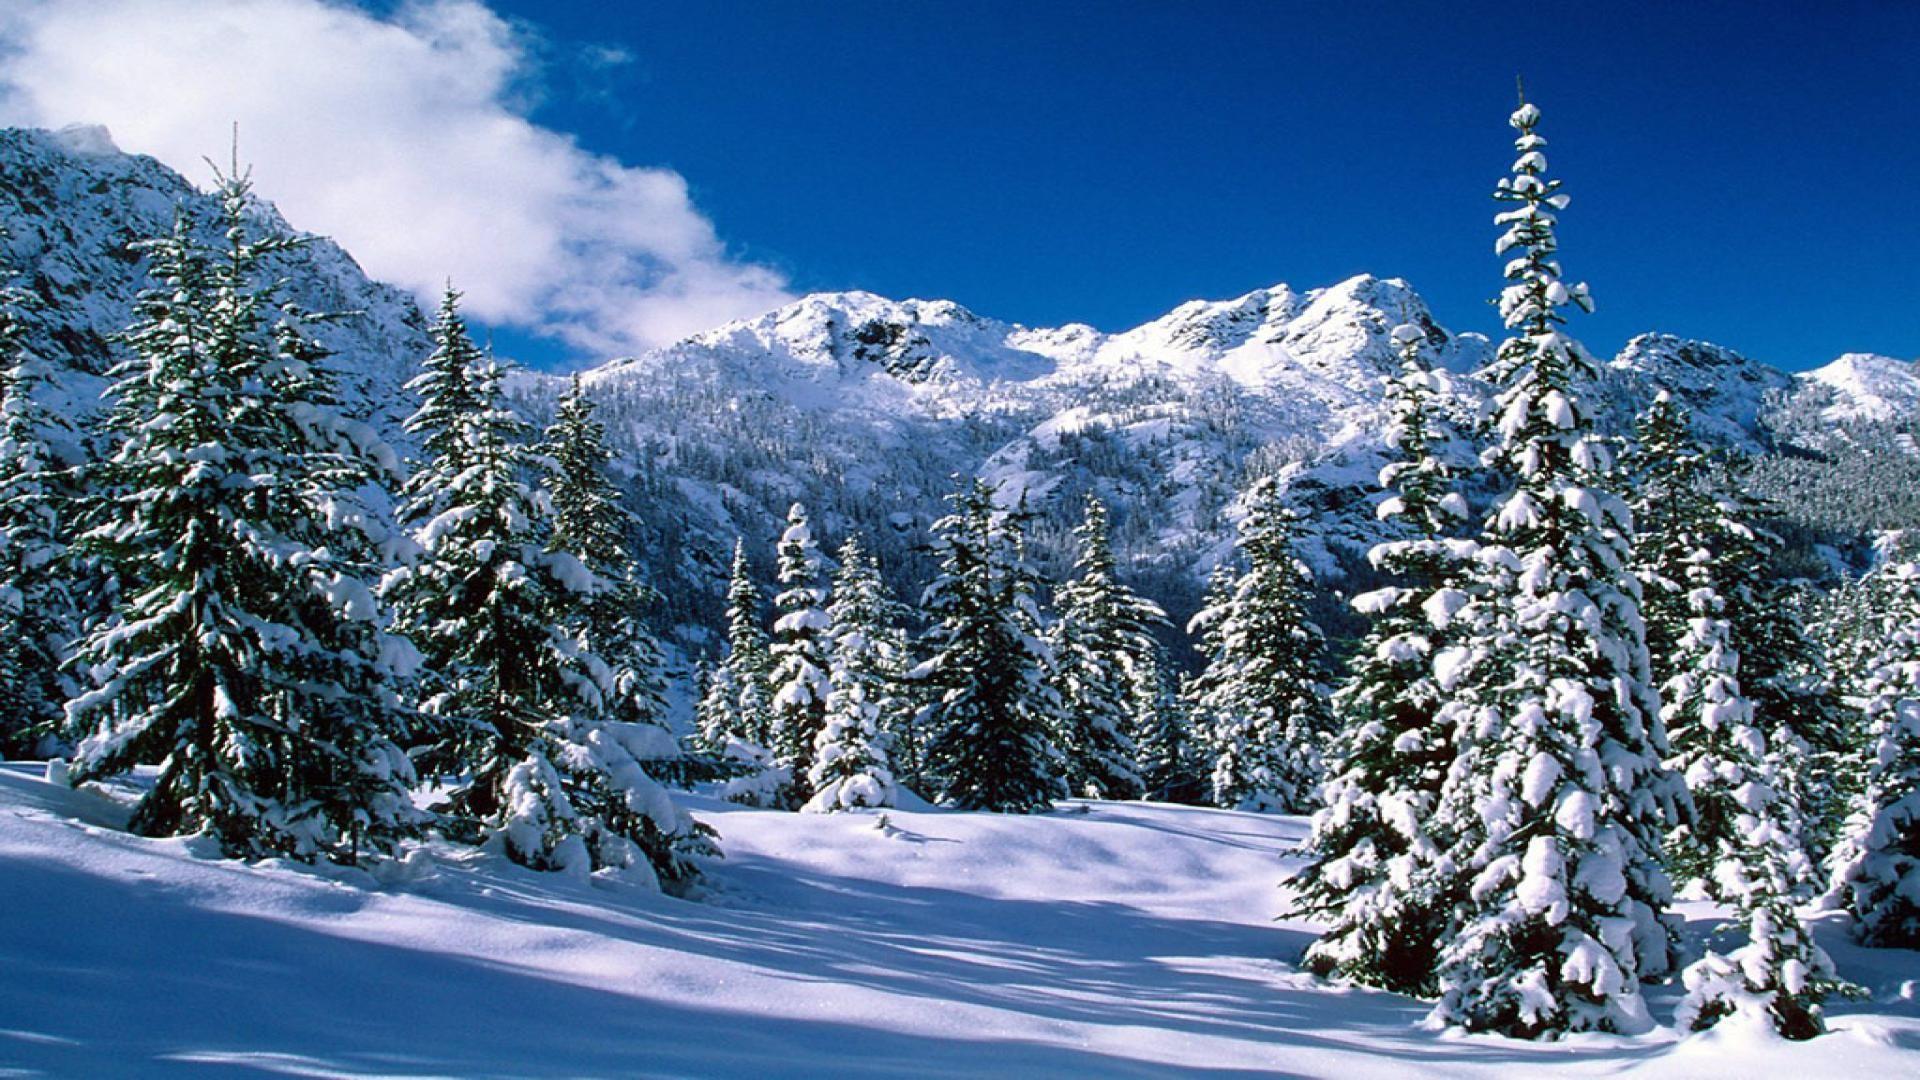 Snow Scenes Desktop Background Alpine See Wildnis Washington An Winter Wallpaper Winter Landscape Winter Landscape Photography